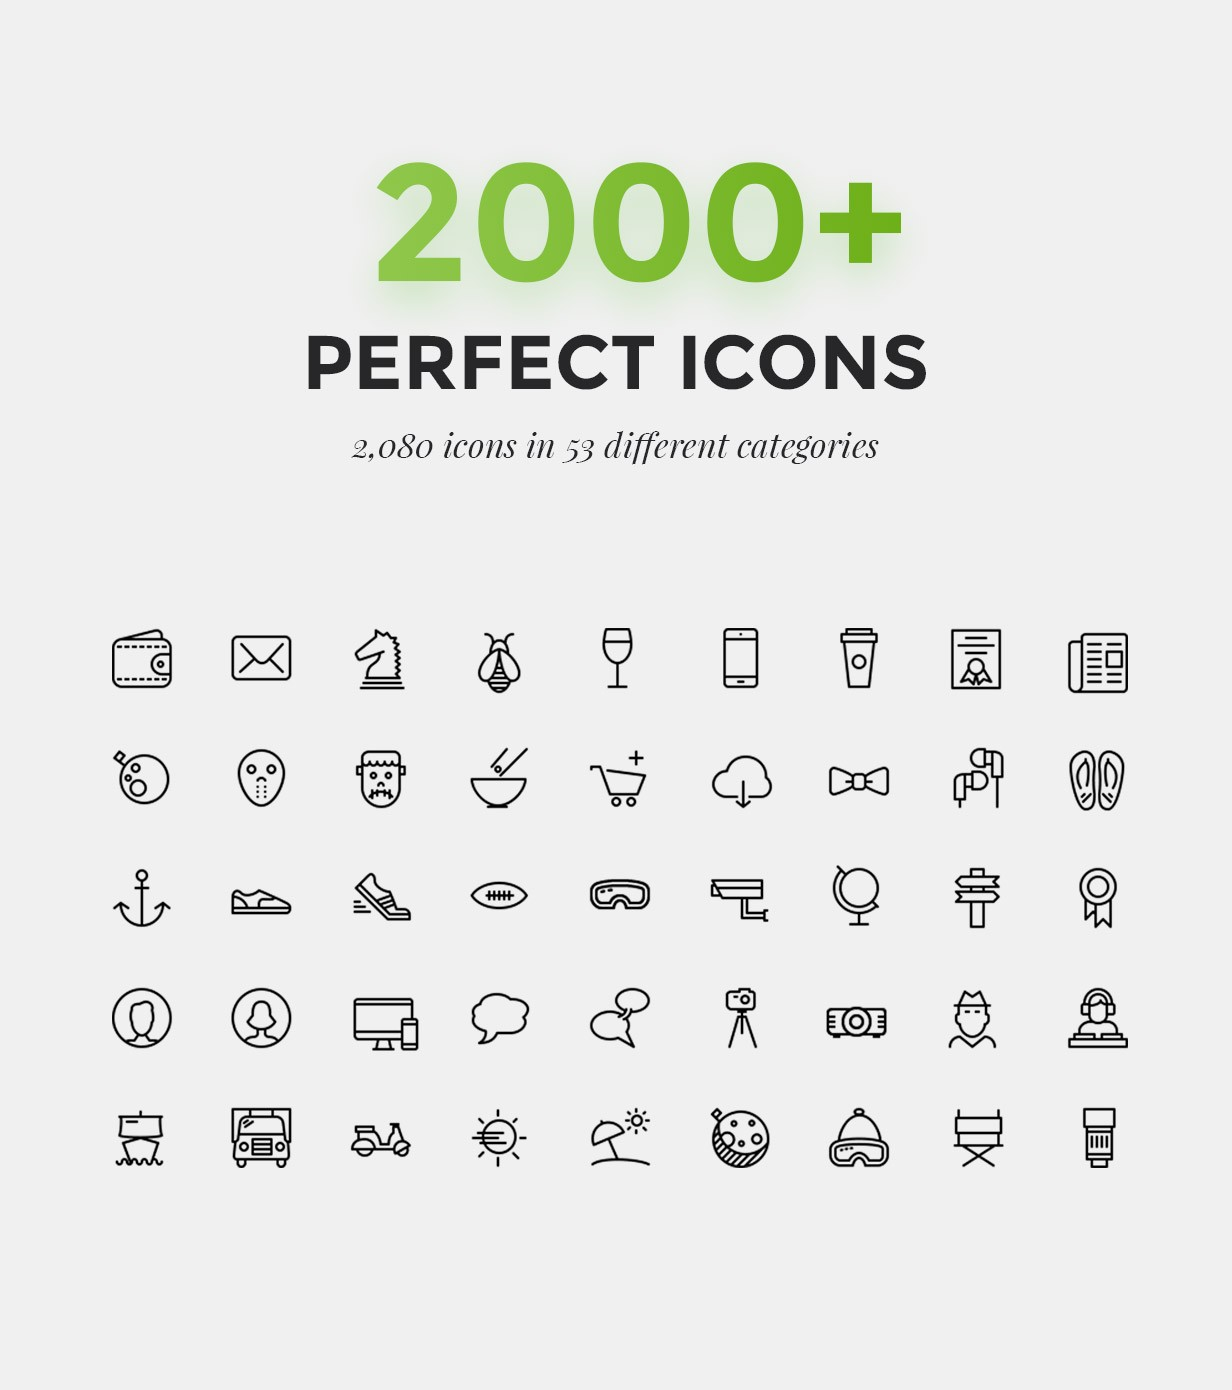 2000 ícones surpreendentes para 53 categorias